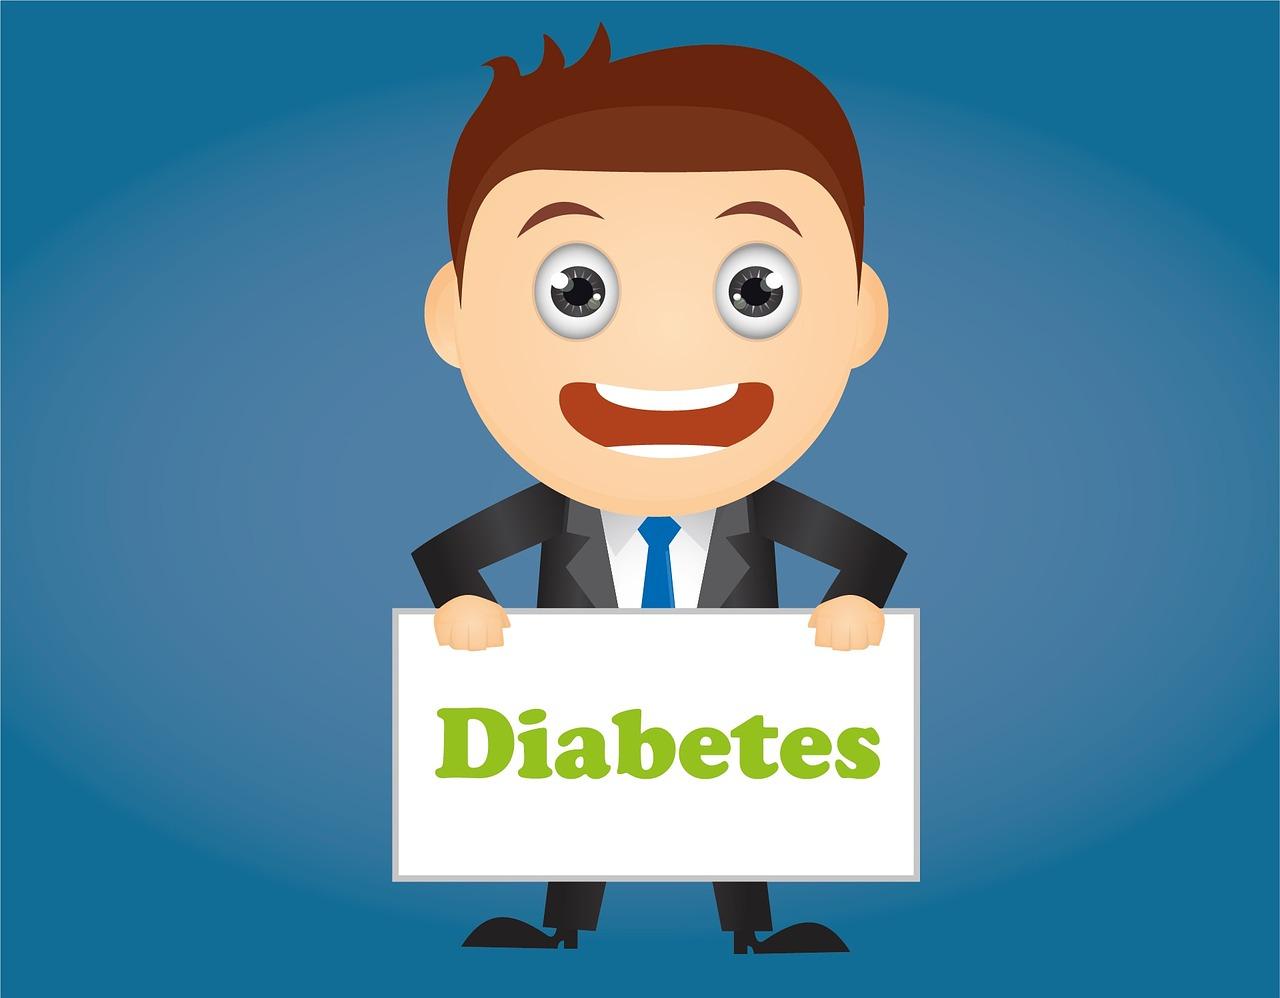 diabetes-1270346_1280